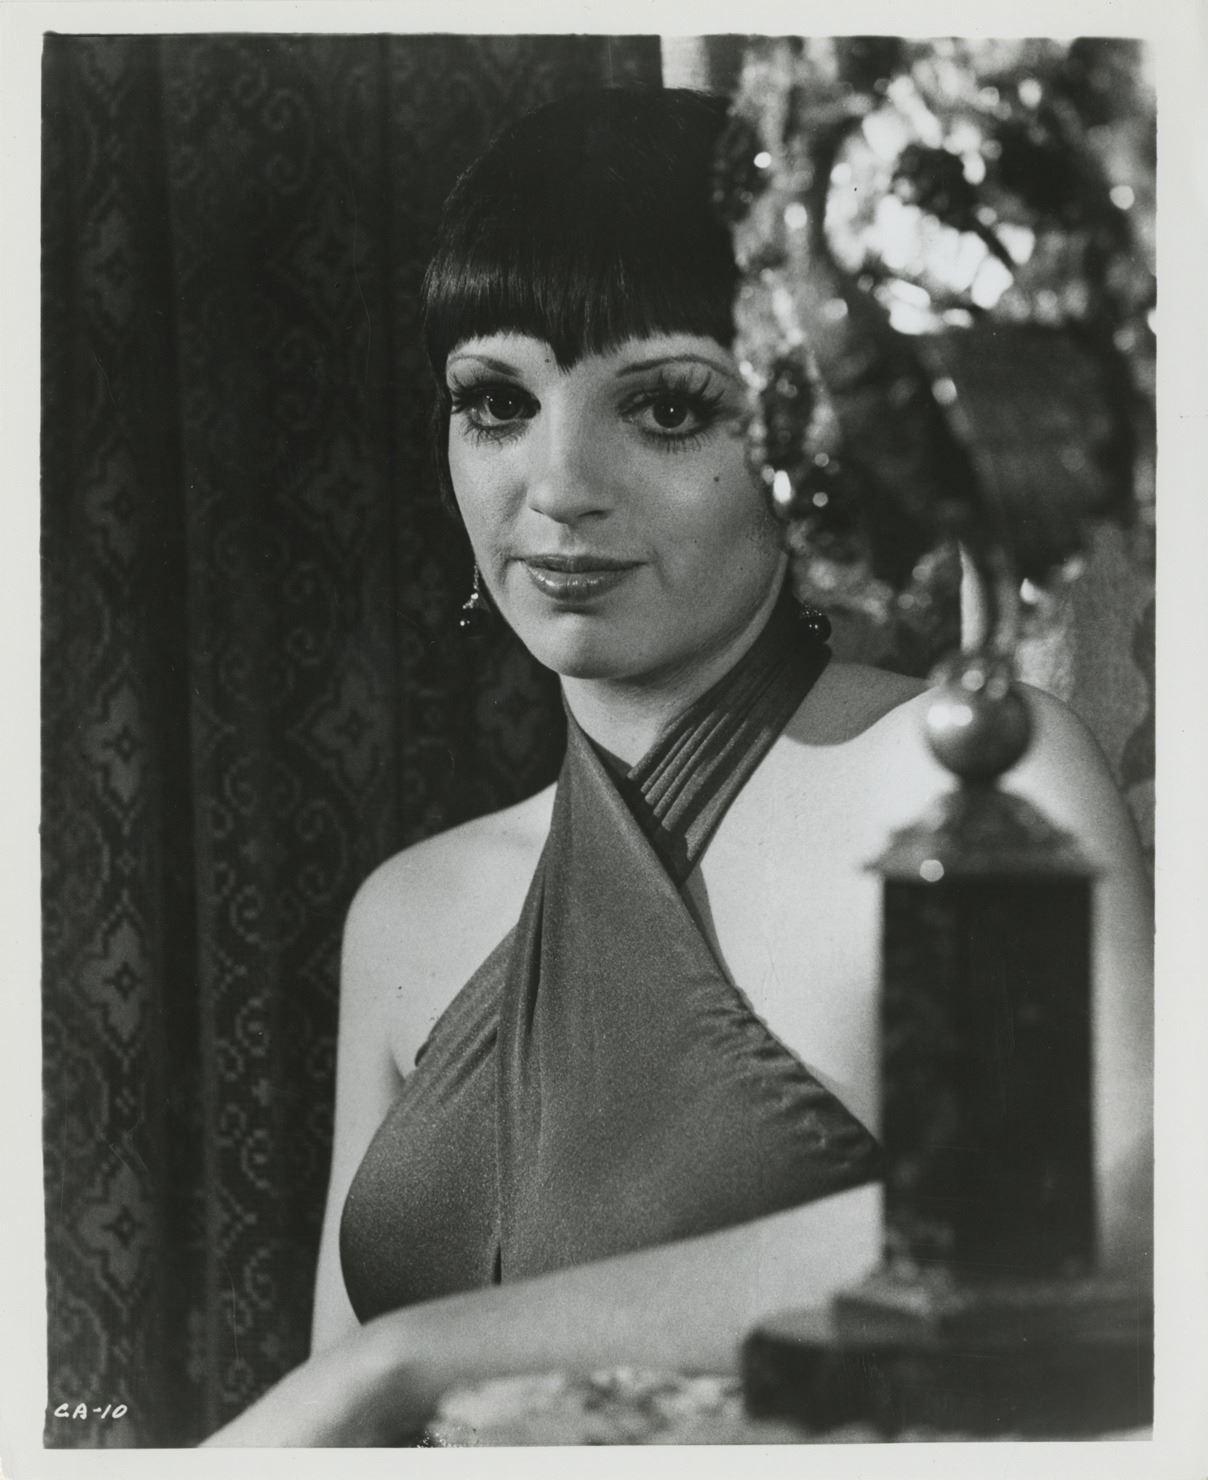 Liza Minnelli (40+) photographs from Cabaret